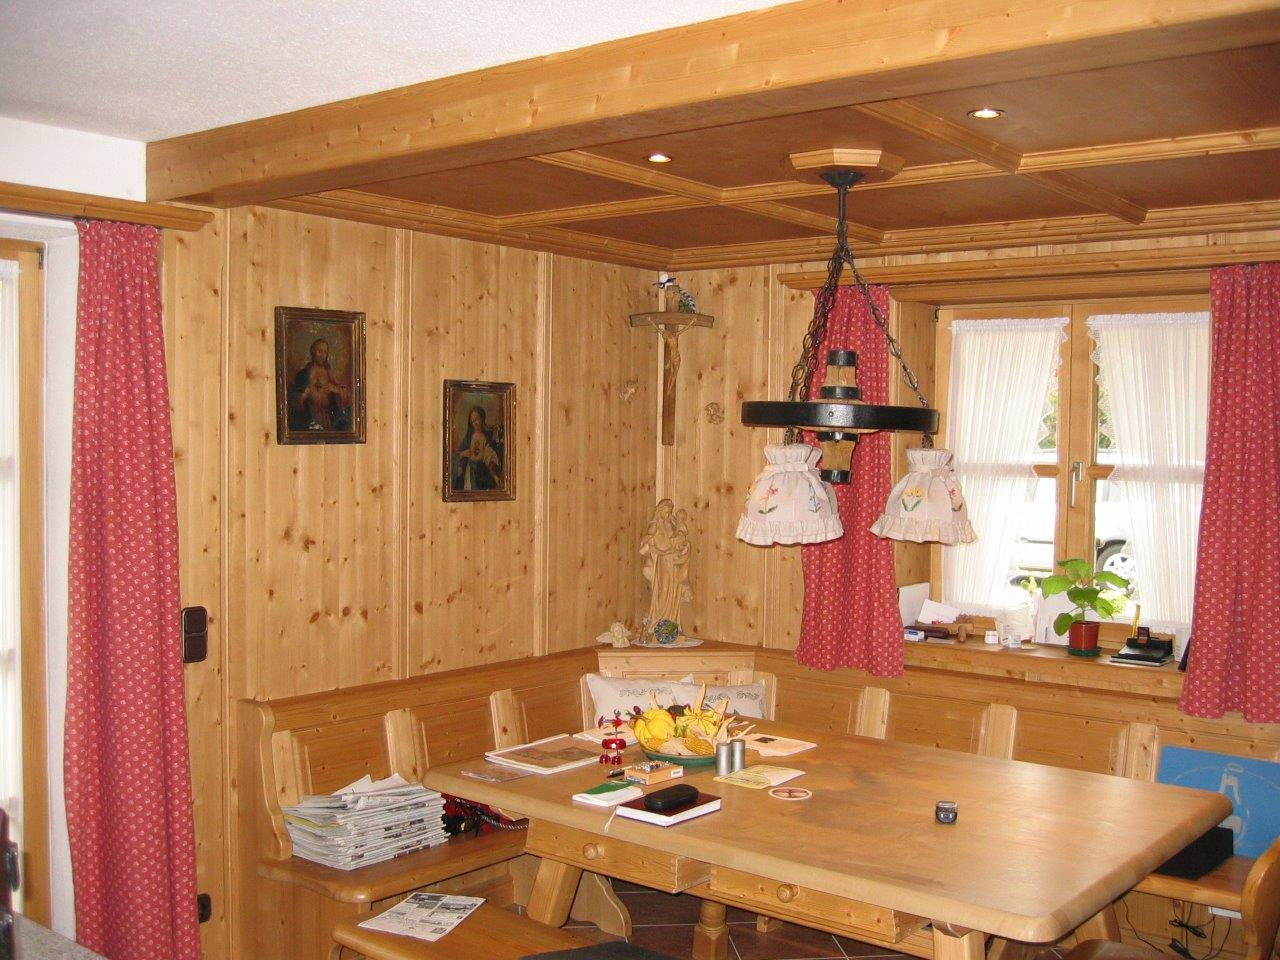 essecke modell kirchbach im k chenbereich m bel. Black Bedroom Furniture Sets. Home Design Ideas